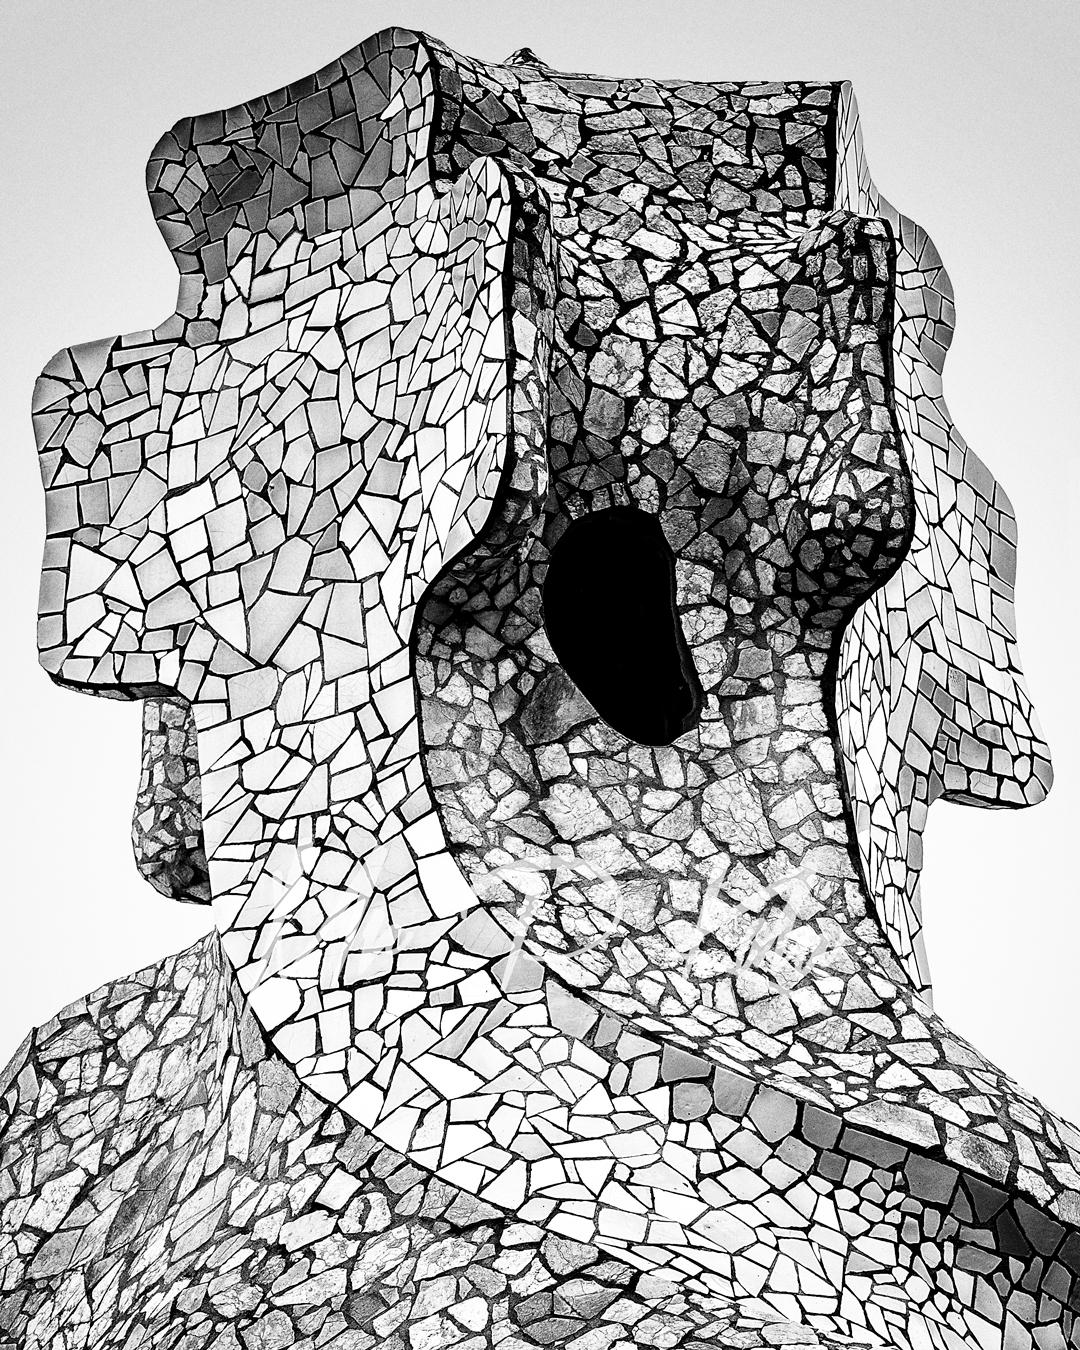 Chimney or Espanta Bruixes designed by Gaudi in Casa Mila